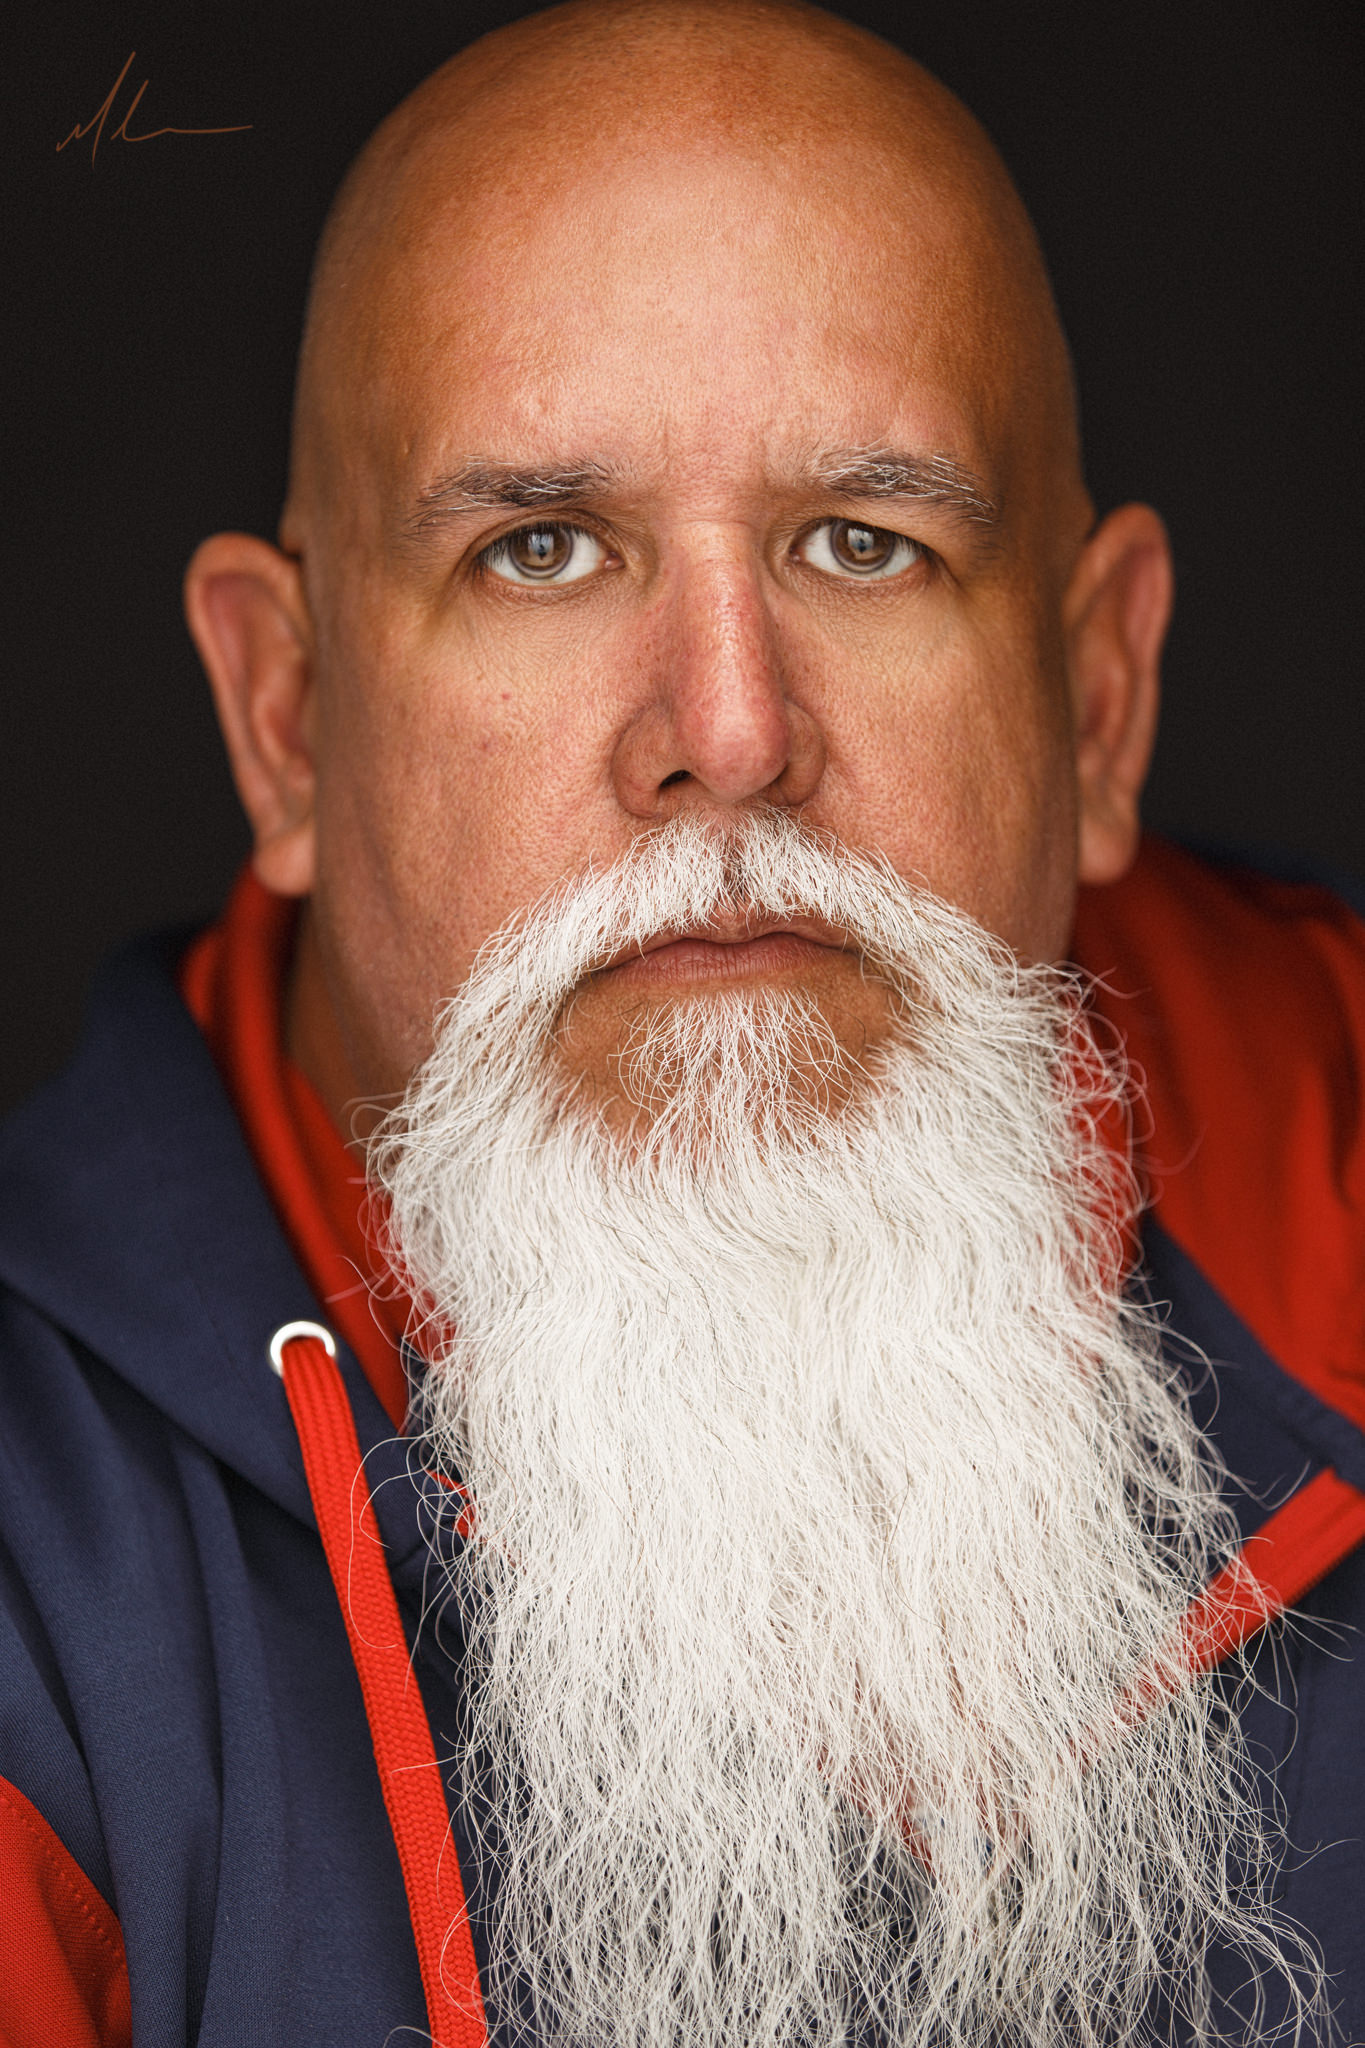 Rick_Headshot_MichaelMoonPhotography.jpg